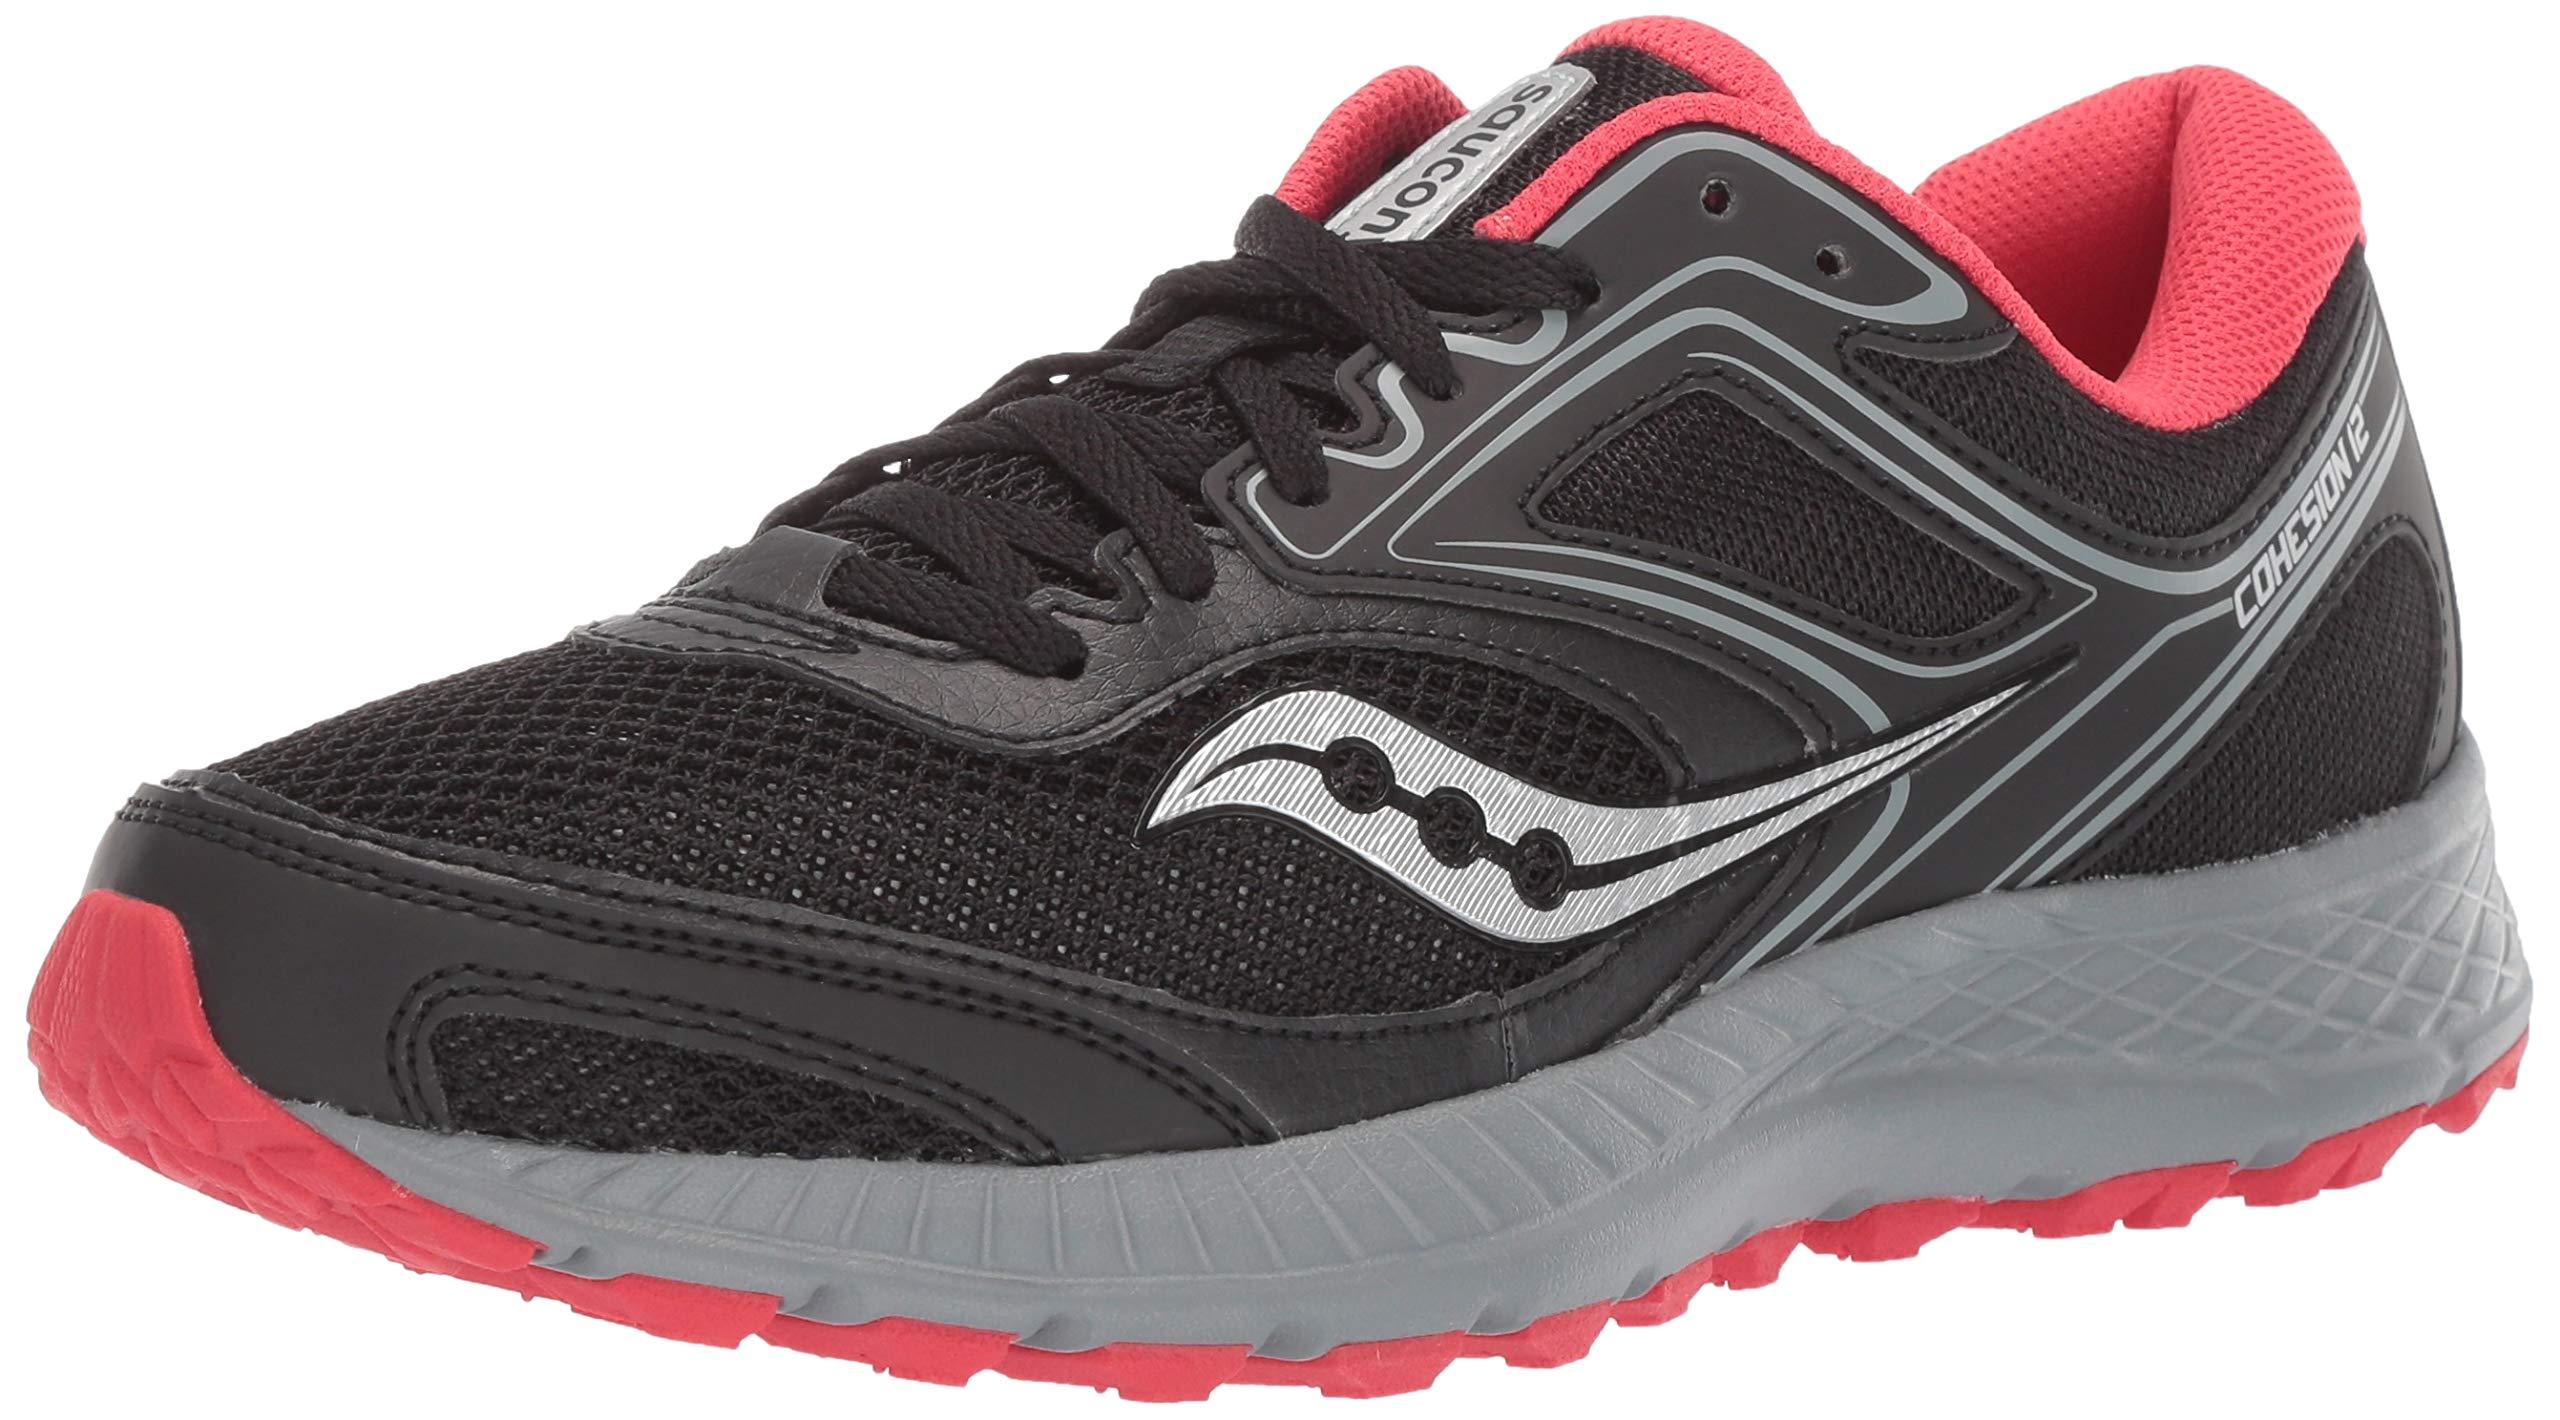 Saucony Women's VERSAFOAM Cohesion TR12 Trail Running Shoe, Black/Grey/Hibiscus, 5 M US